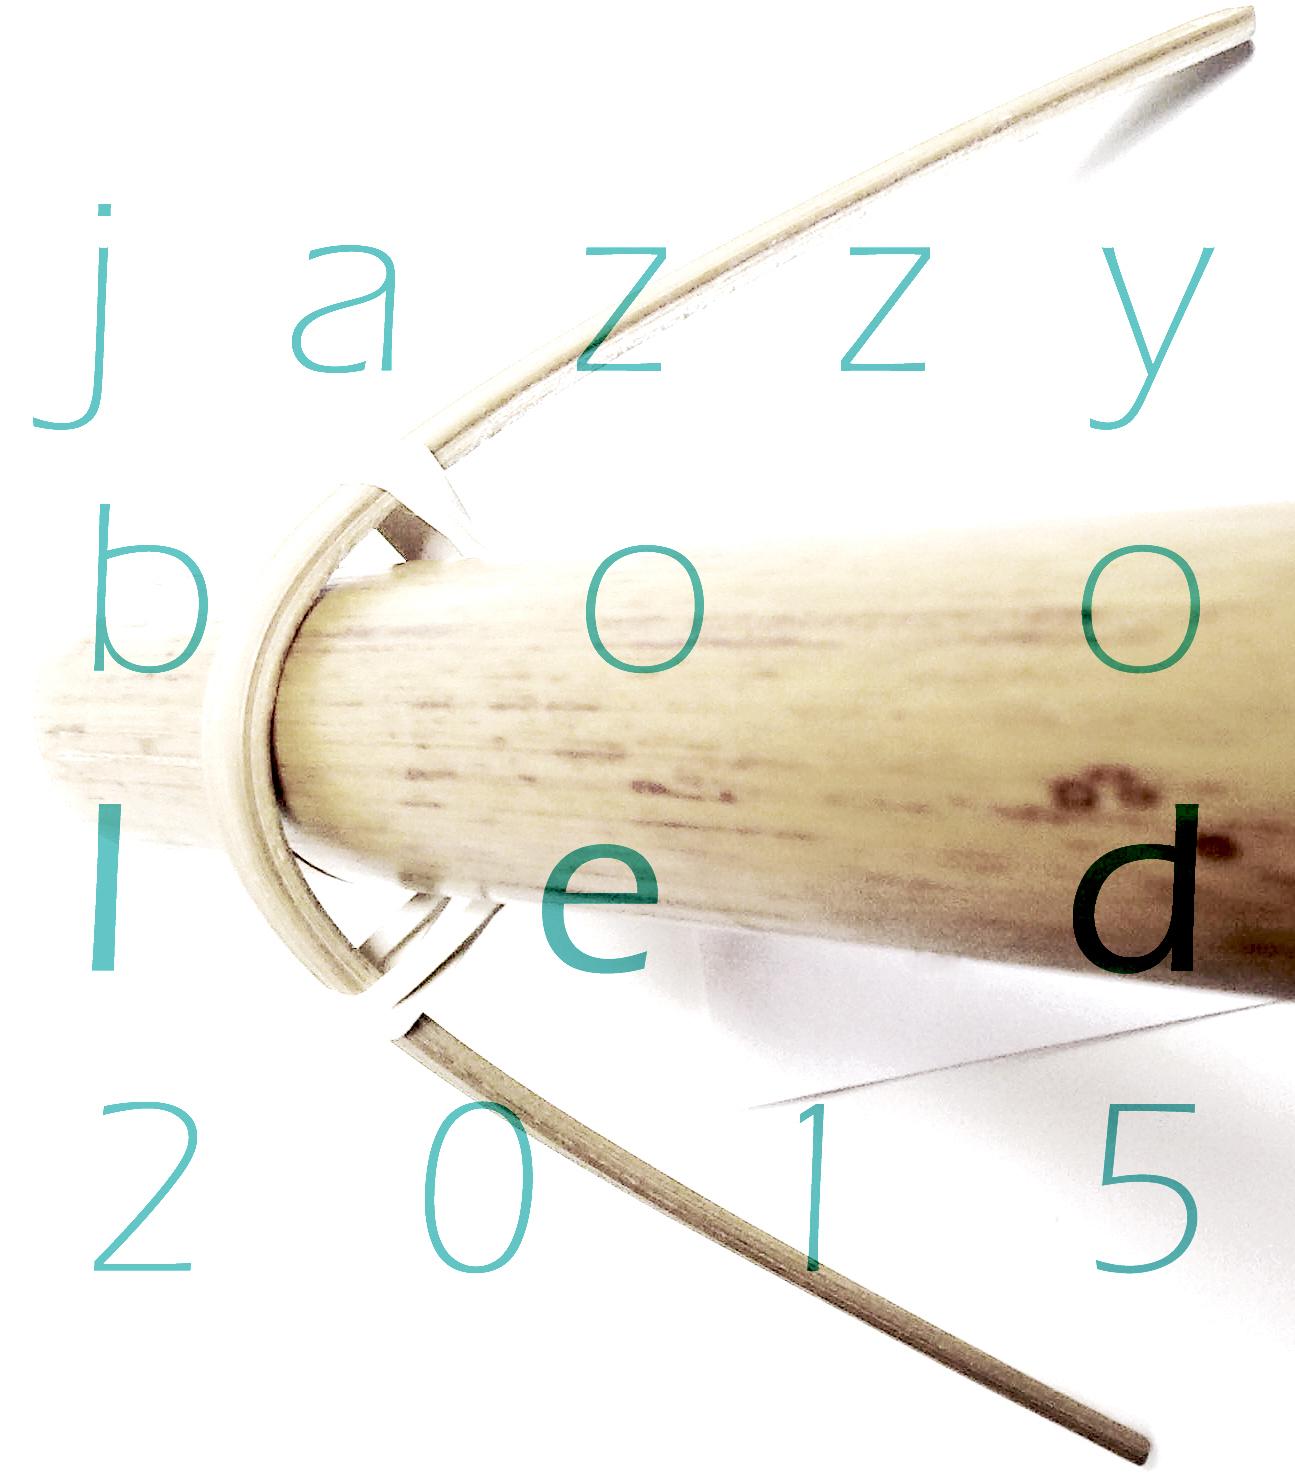 JBL - 2015 Jazzyboo led nuova versione.